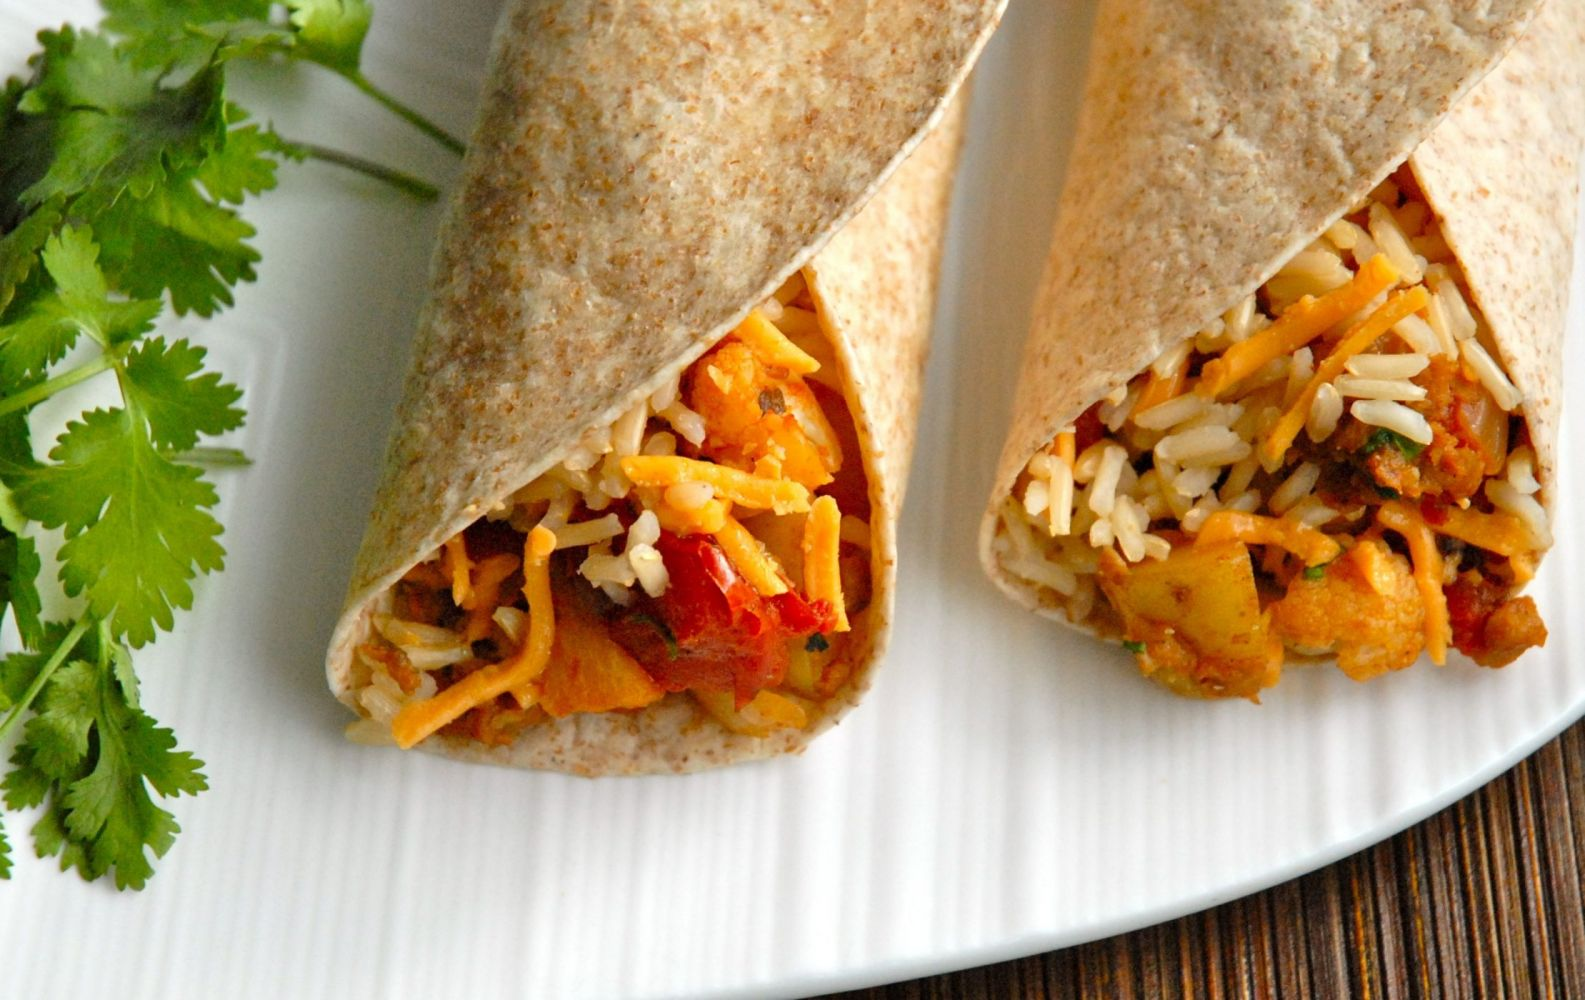 аппарат мексиканская кухня фаст фуд рецепты с фото особенности, если решили